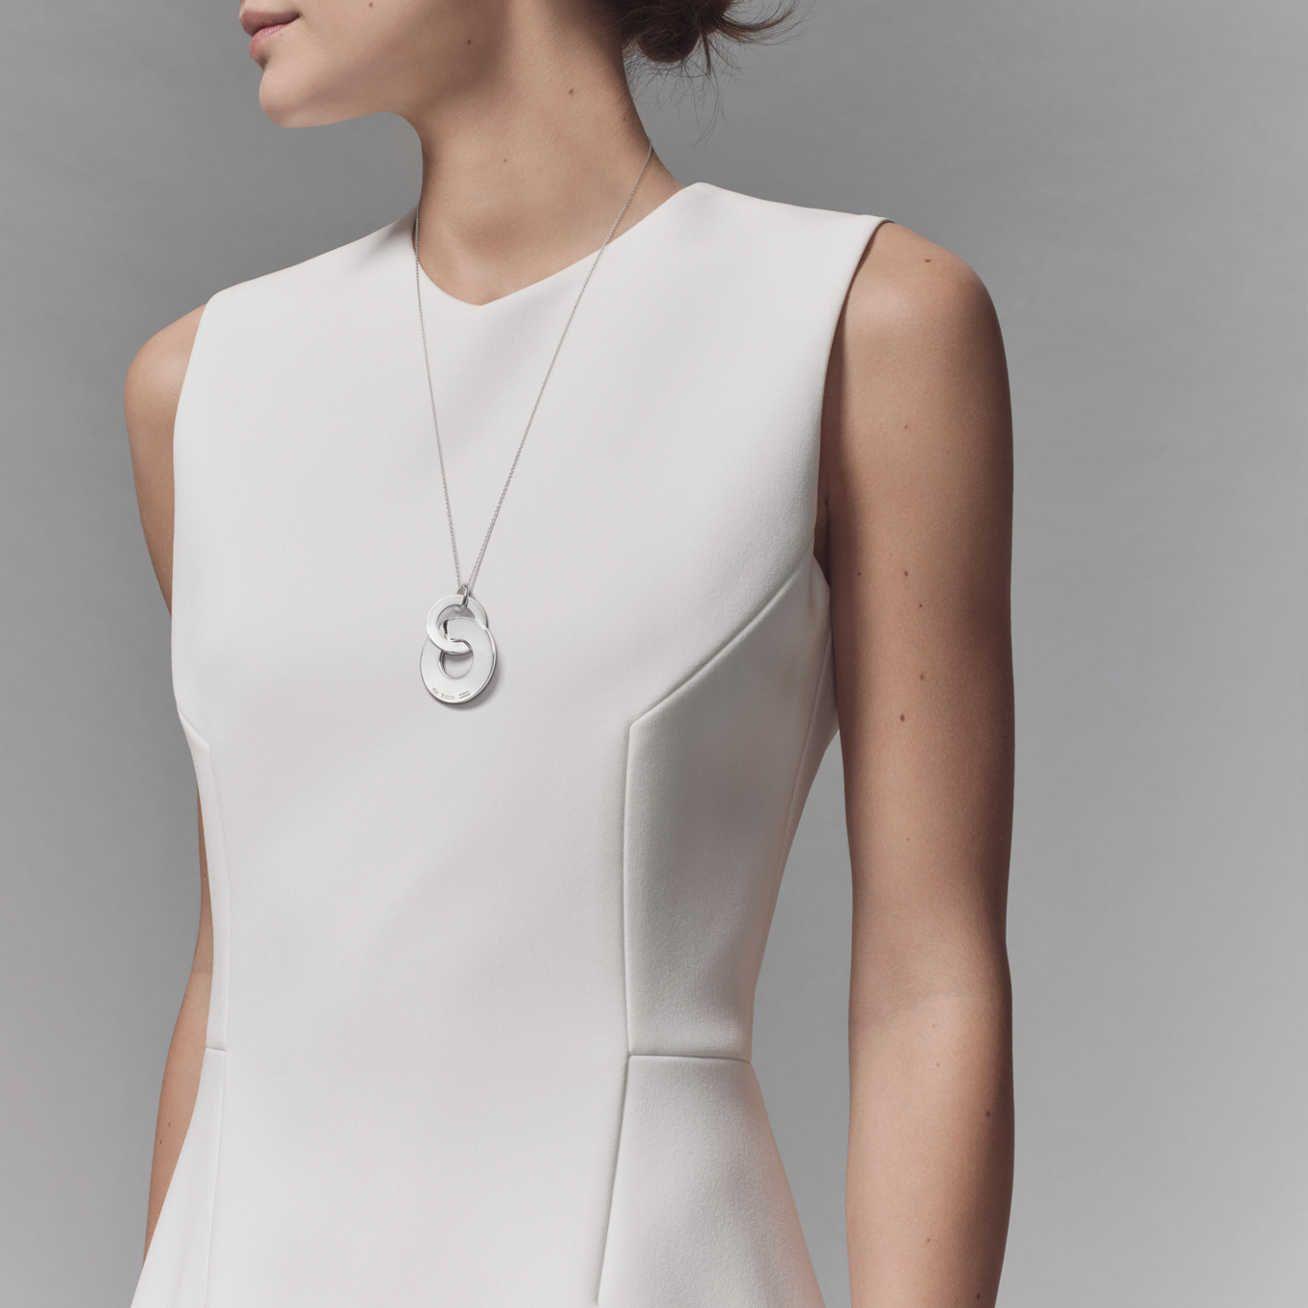 d3184b0d5 Tiffany 1837®:Double Interlocking Drop Pendant | I Might Buy | Mens ...